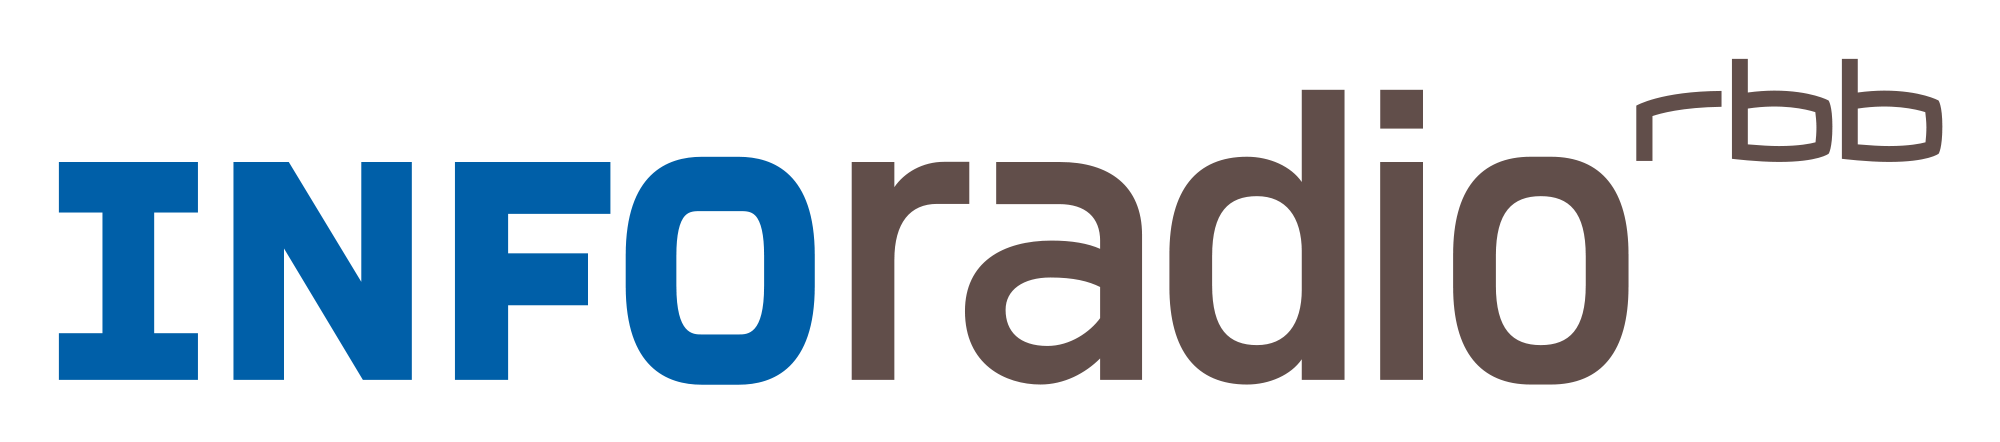 RBB_Inforadio.png